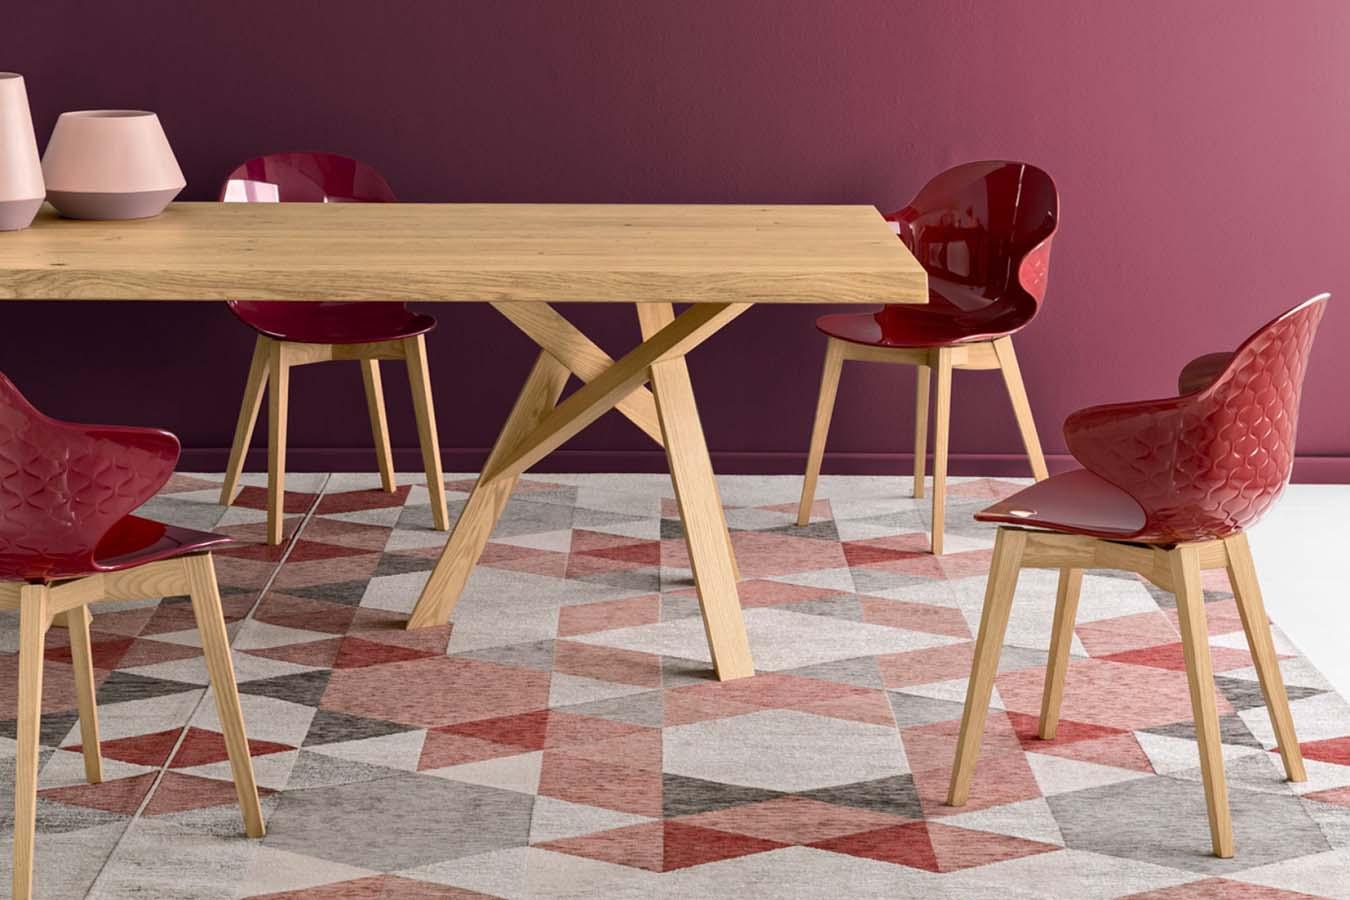 Sedia Saint Tropez di Calligaris gambe in legno da righetti mobili a Novara